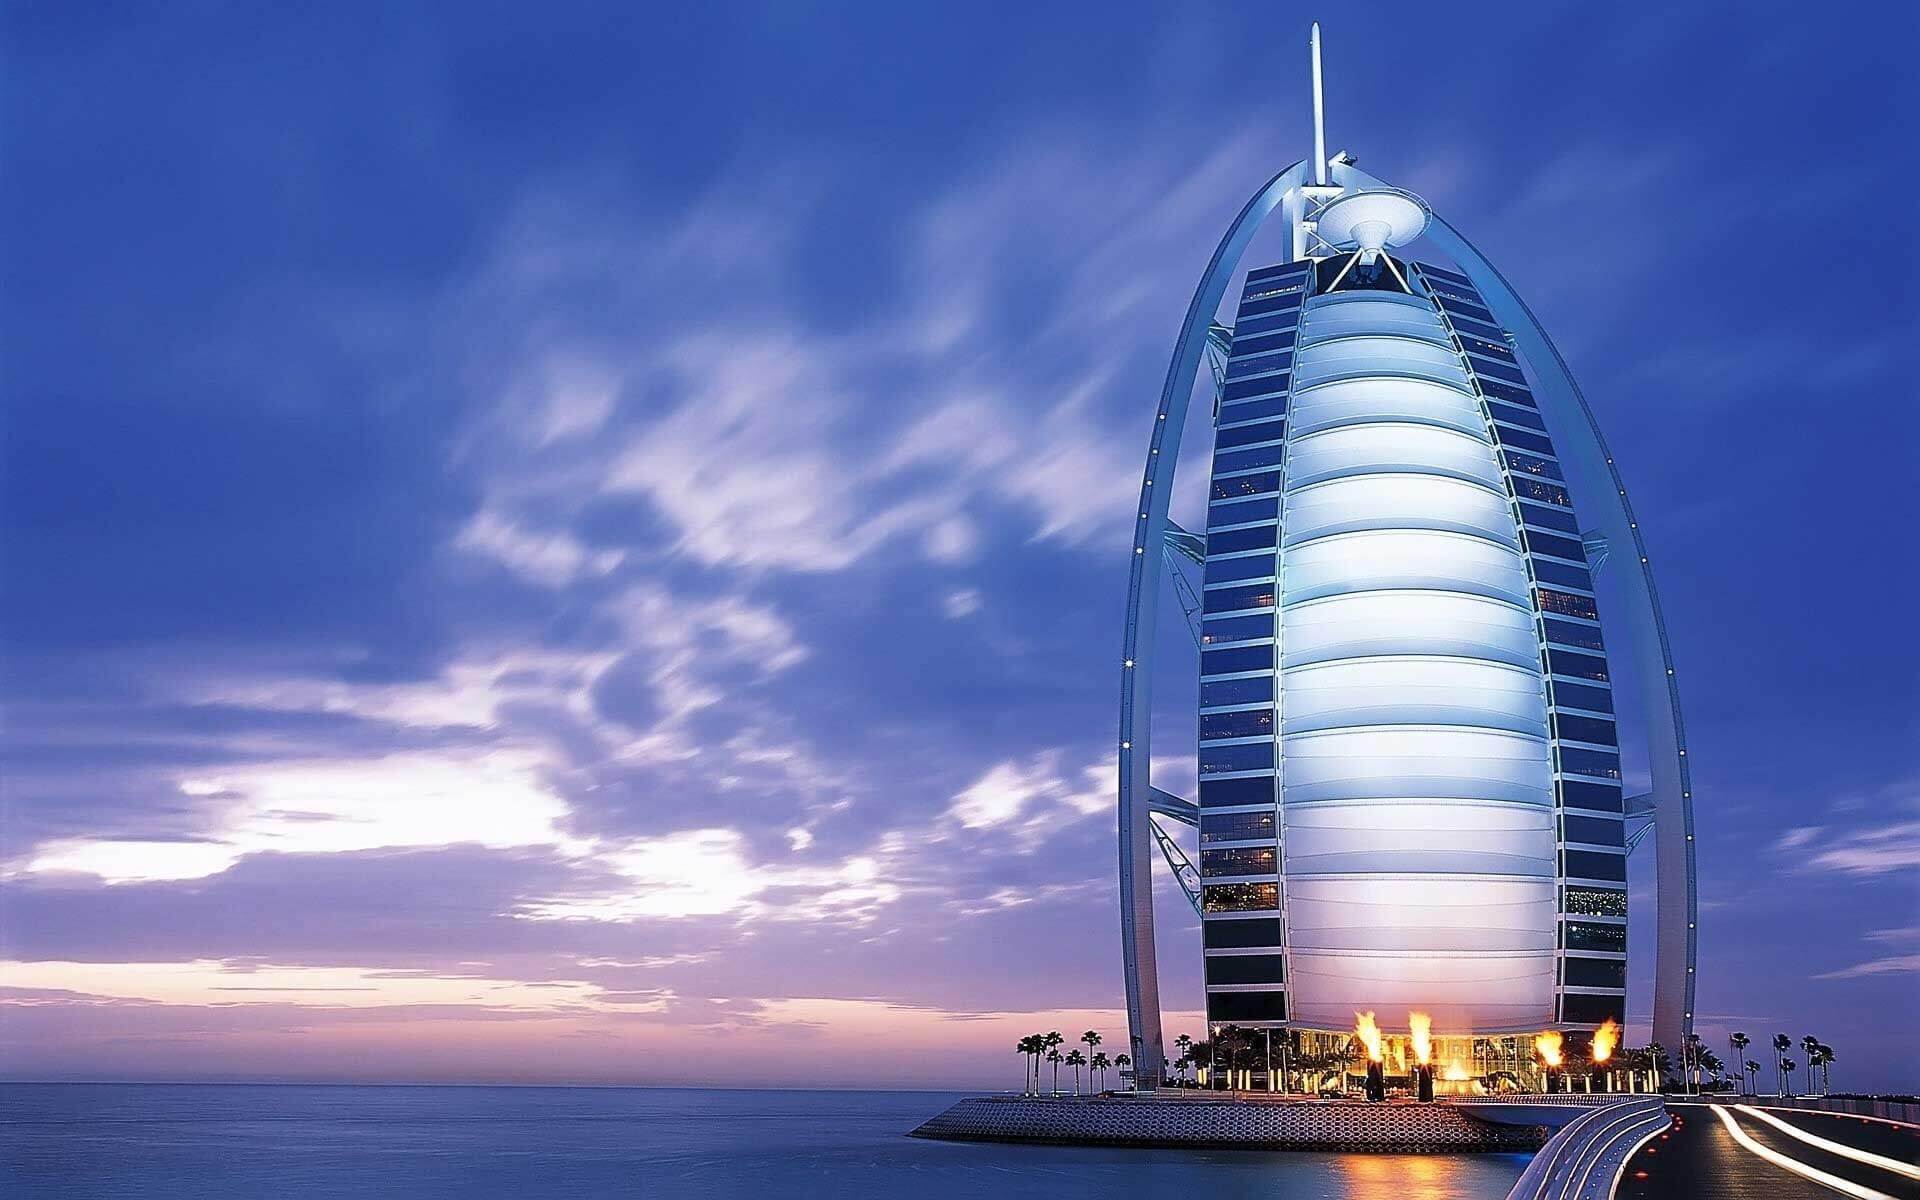 dubai-hotel-7-star_xxv29r Tempat referensi terbaik Menikmati Malam di Dubai Travel Travel Guides